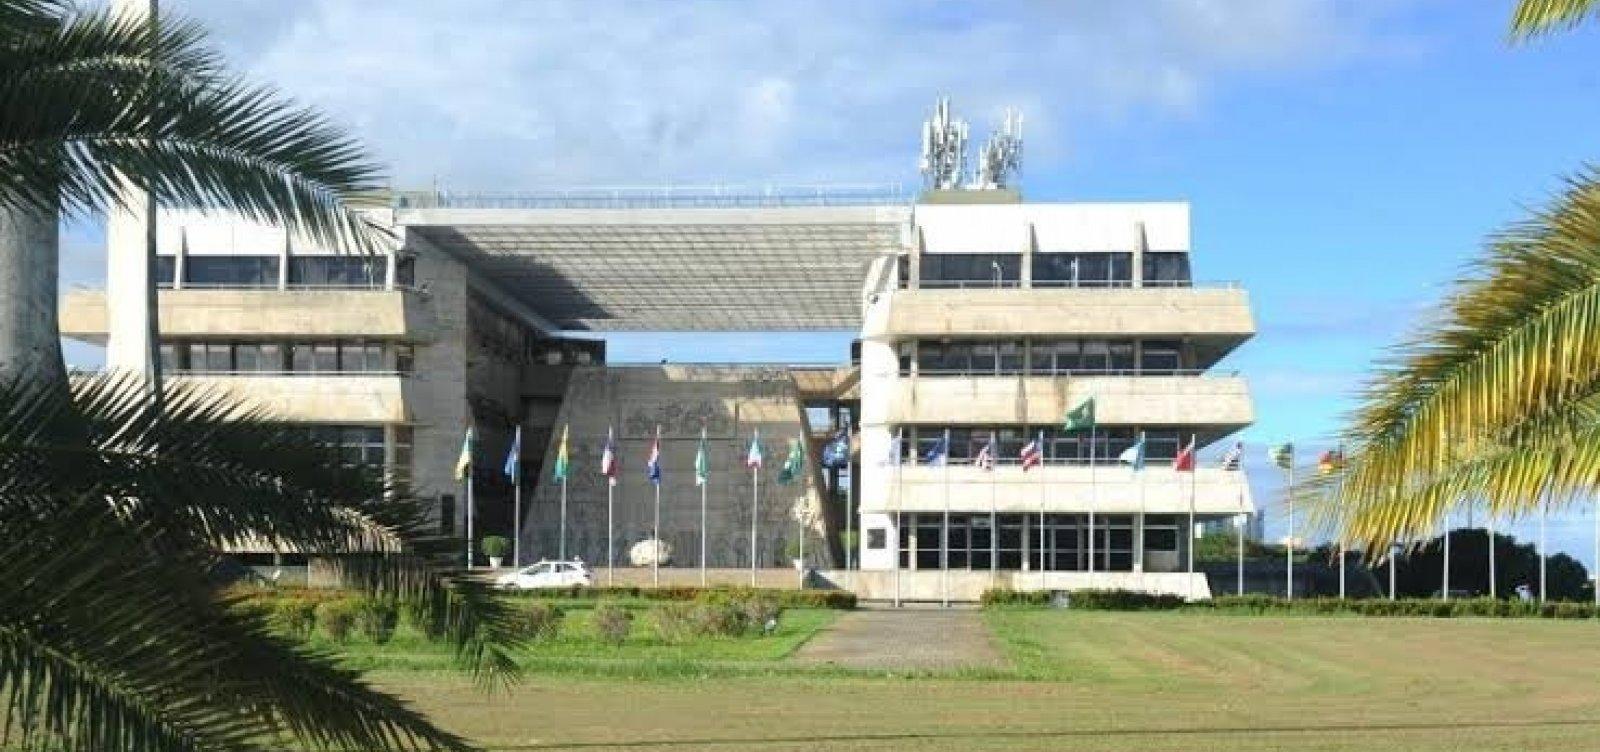 [Servidor da Assembleia Legislativa da Bahia morre de coronavírus]